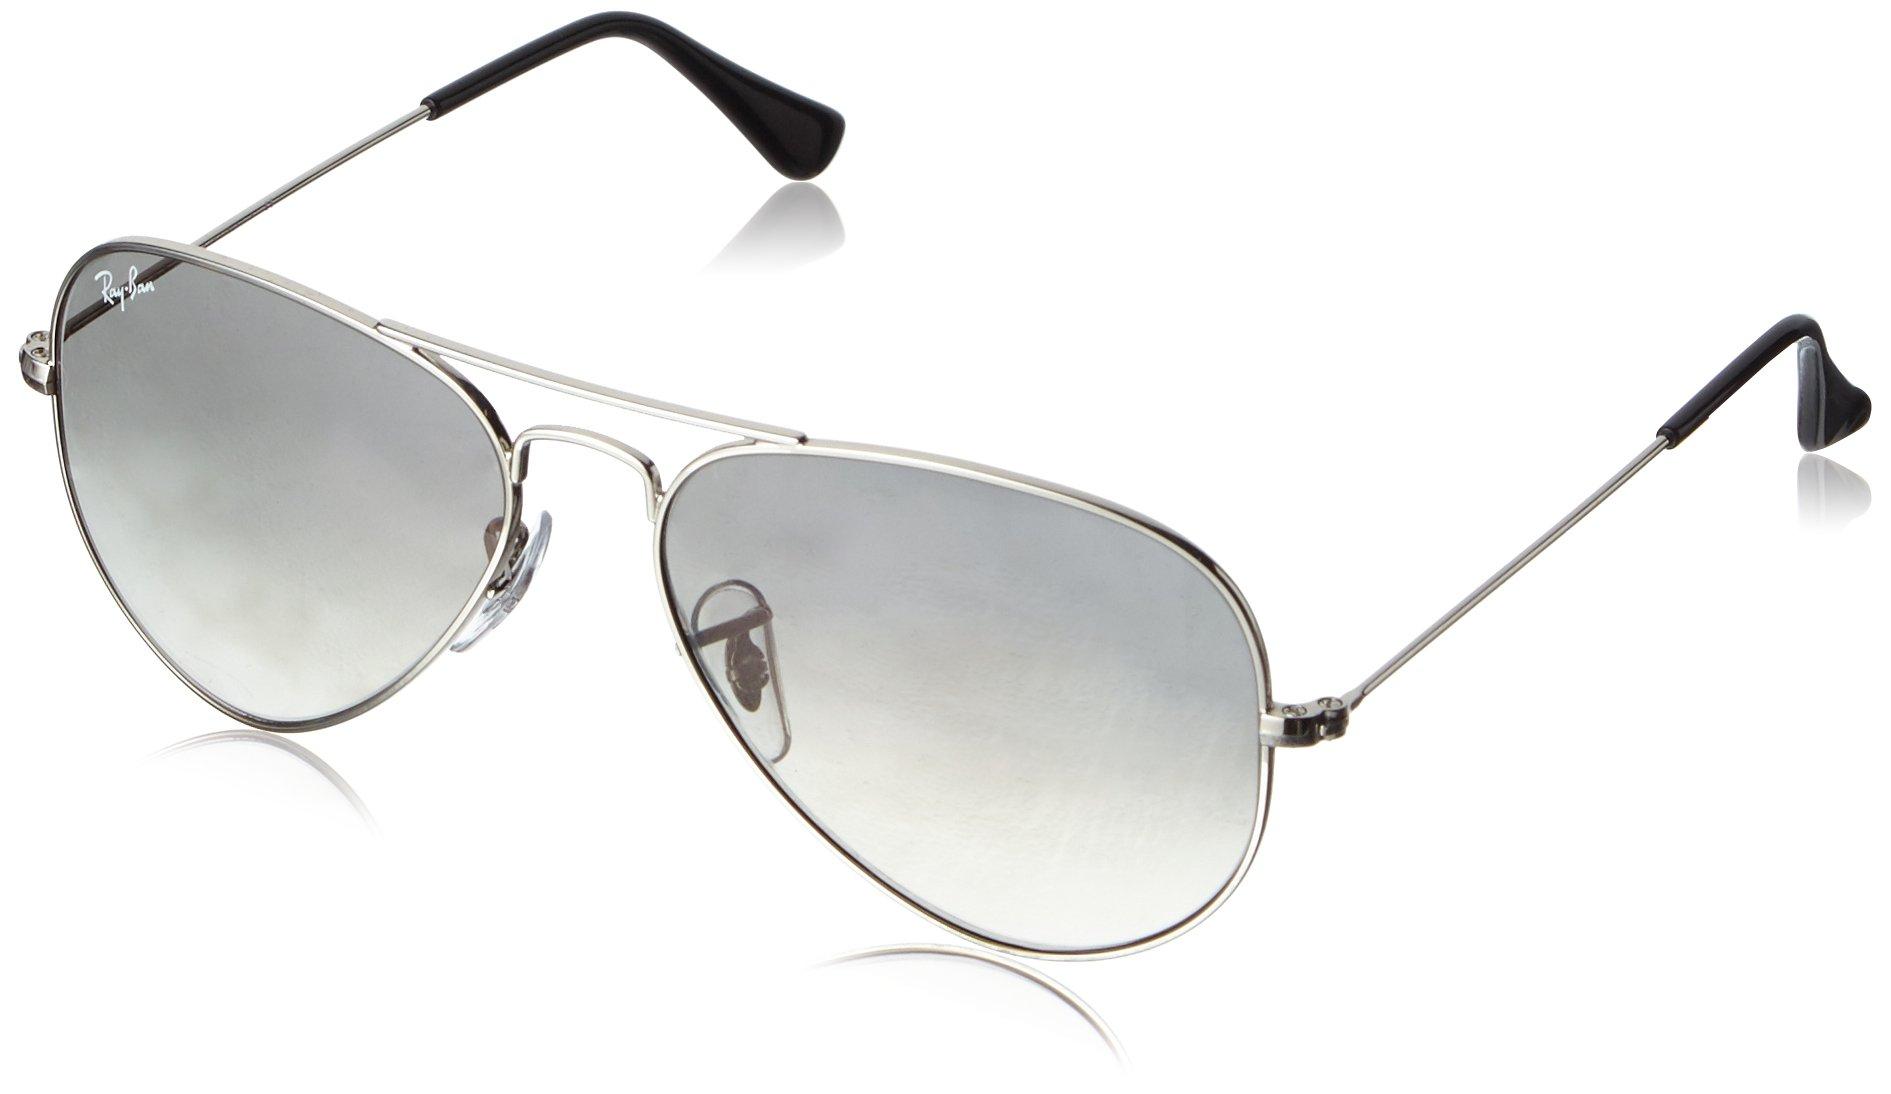 Ray-Ban 3025 Aviator Large Metal Non-Mirrored Non-Polarized Sunglasses, Silver/Light Grey Gradient (003/32), 58mm